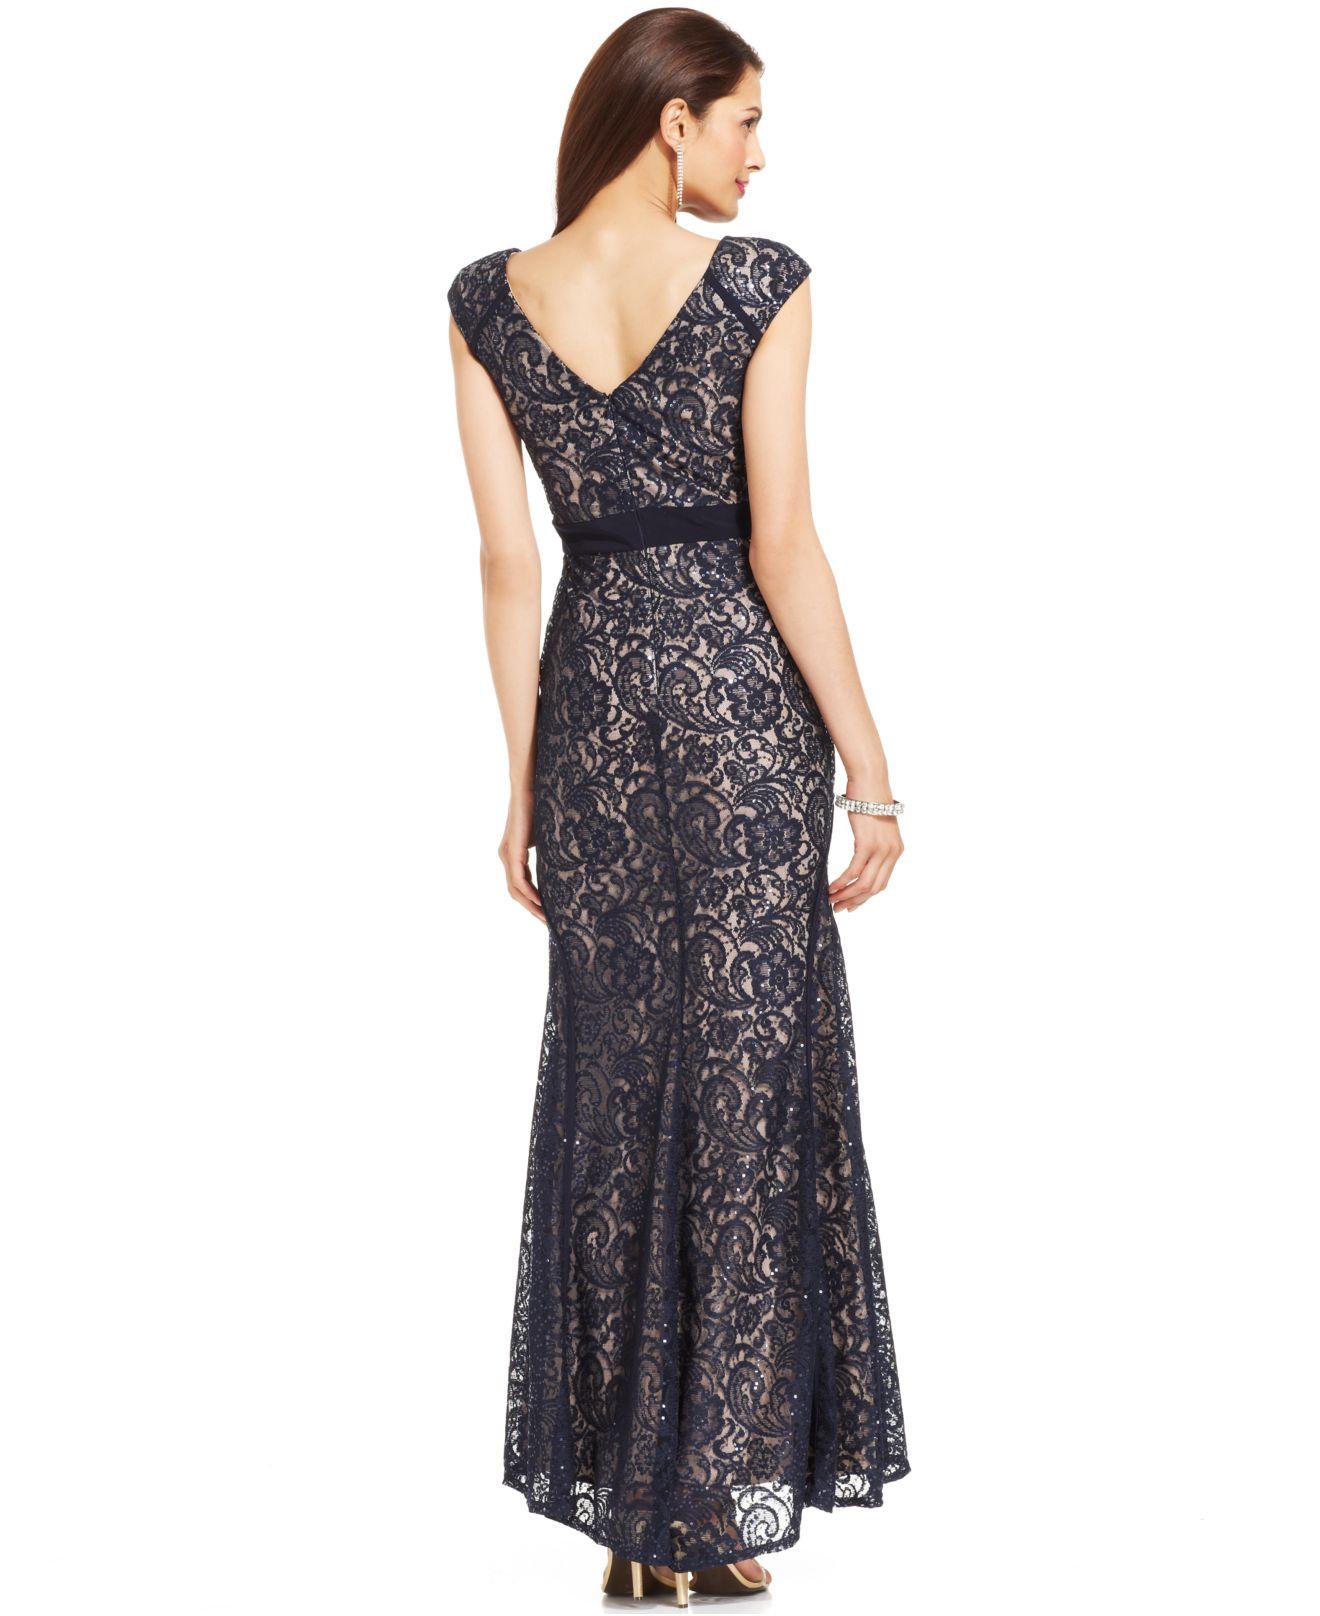 Xscape Sleeveless Glitter Lace Mermaid Gown